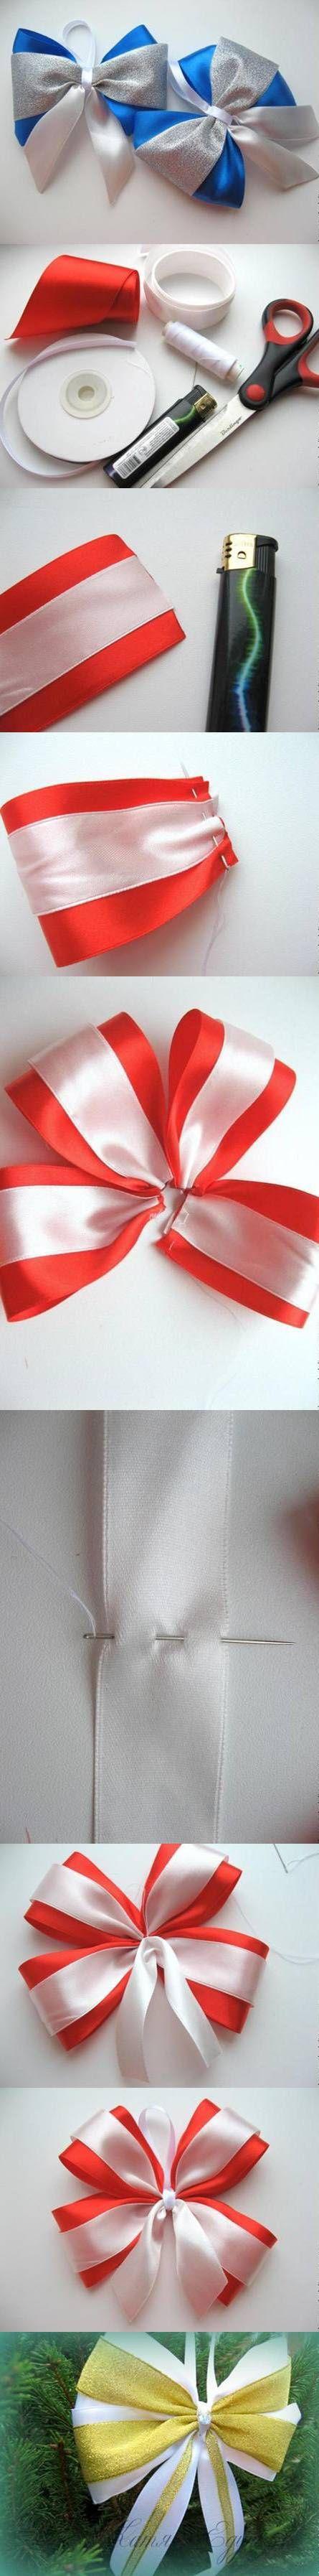 Cute Bow | DIY & Crafts Tutorials